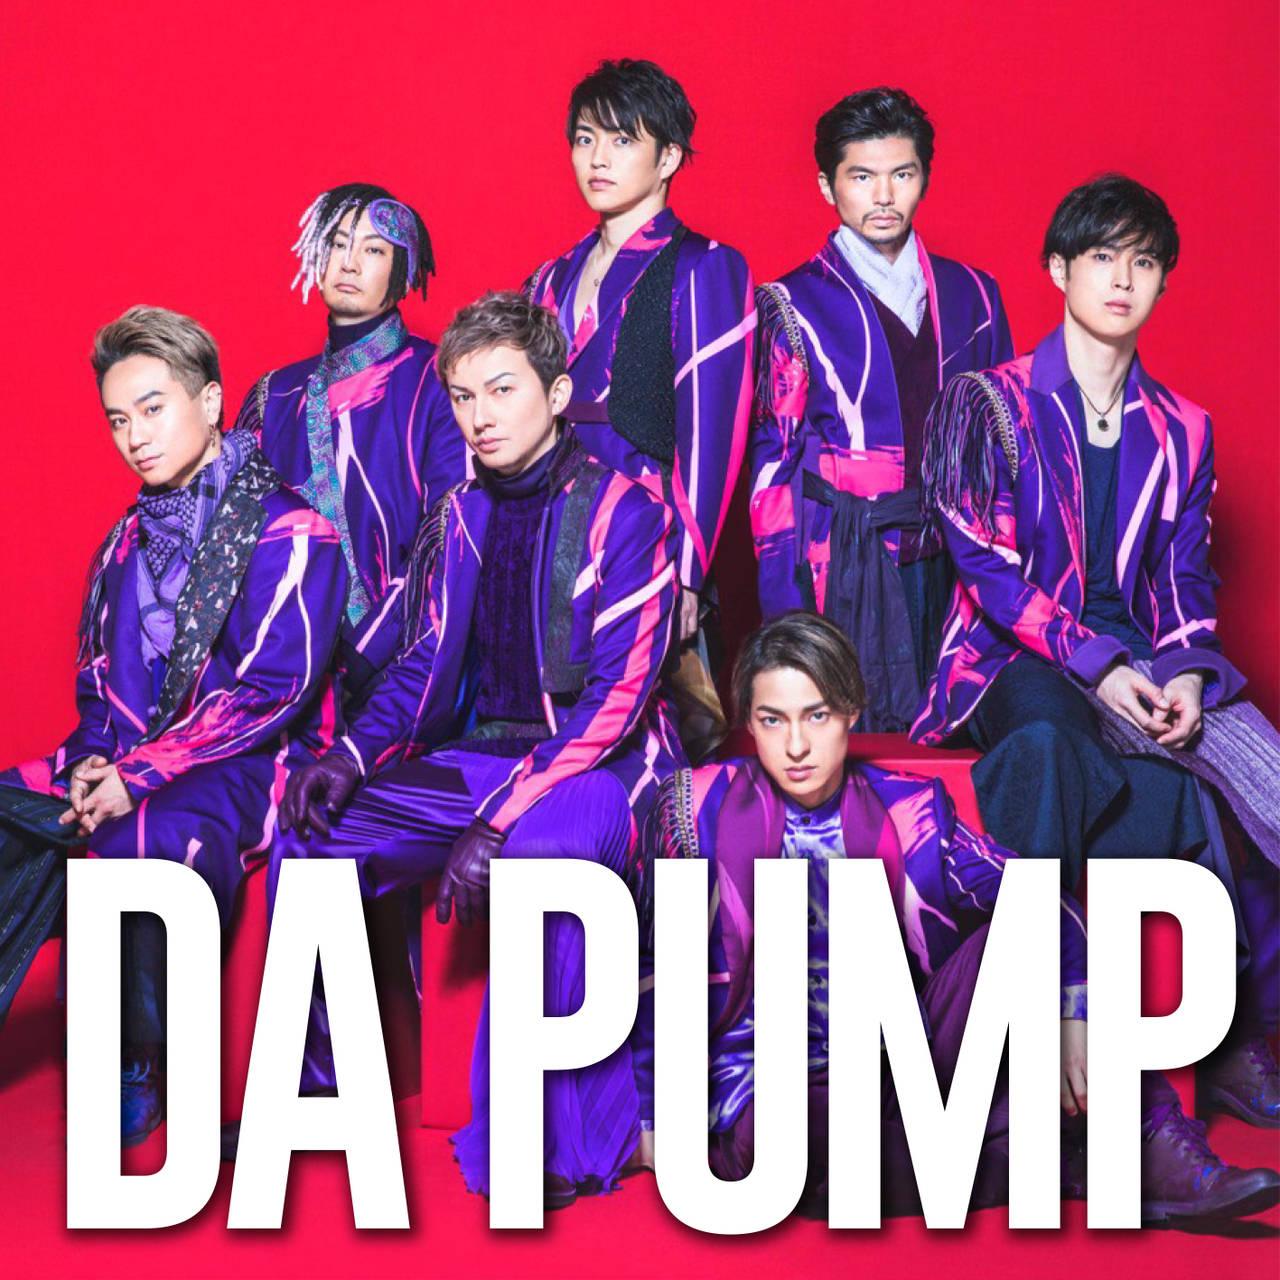 DA PUMP 2019年の新曲「桜」がTBS「CDTV」のオープニング曲に決定! 配信サイトでは早くもランキング1位を獲得!